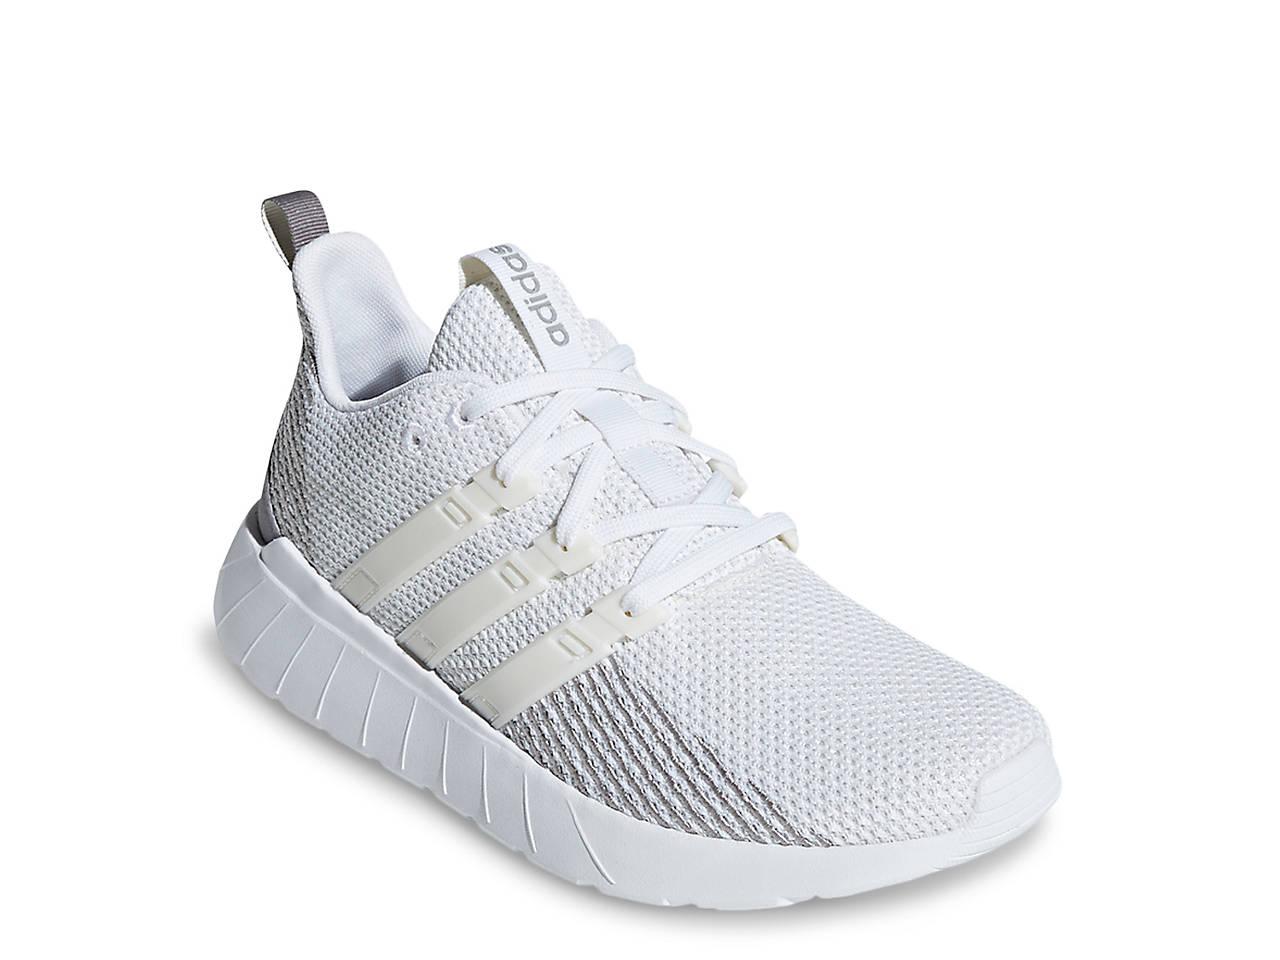 2e3694393ebd adidas Questar Flow Sneaker - Women s Women s Shoes